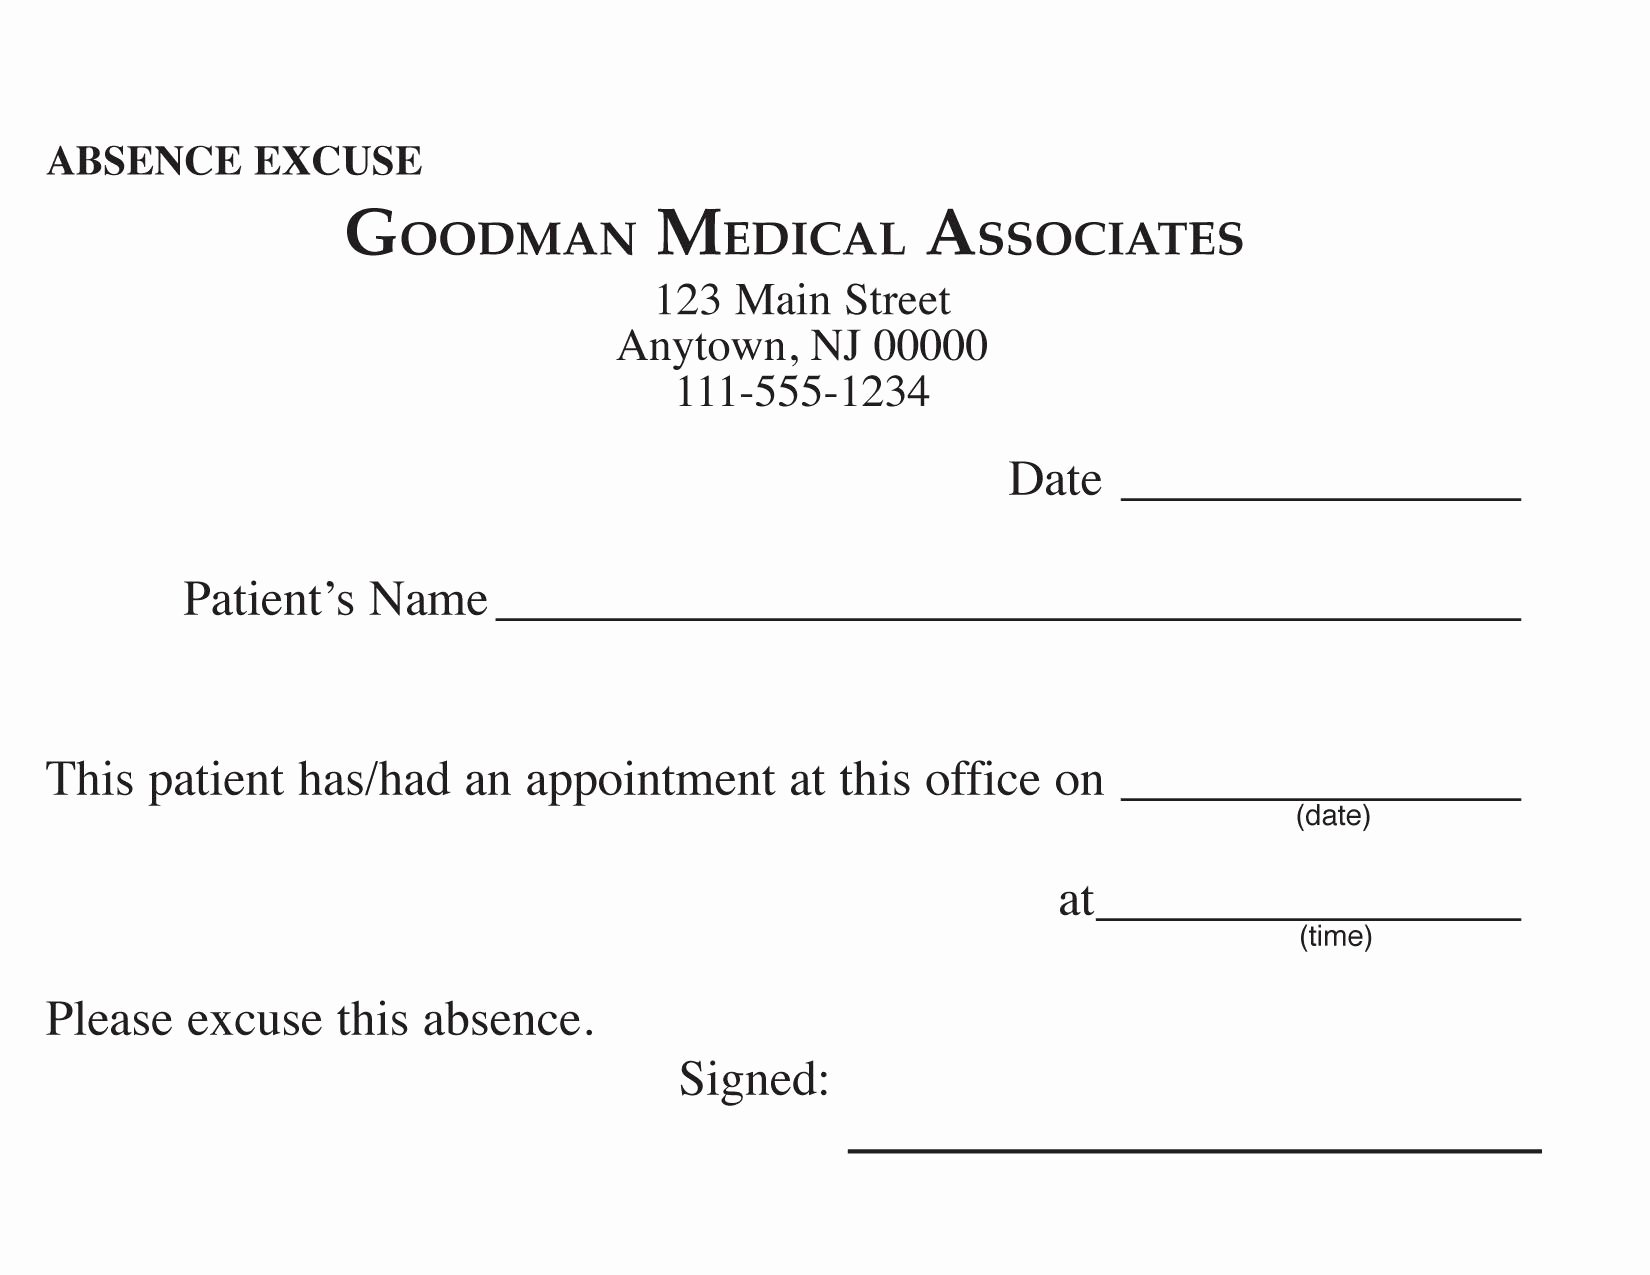 Printable Fake Prescription forms New Blank Printable Doctor Excuse form